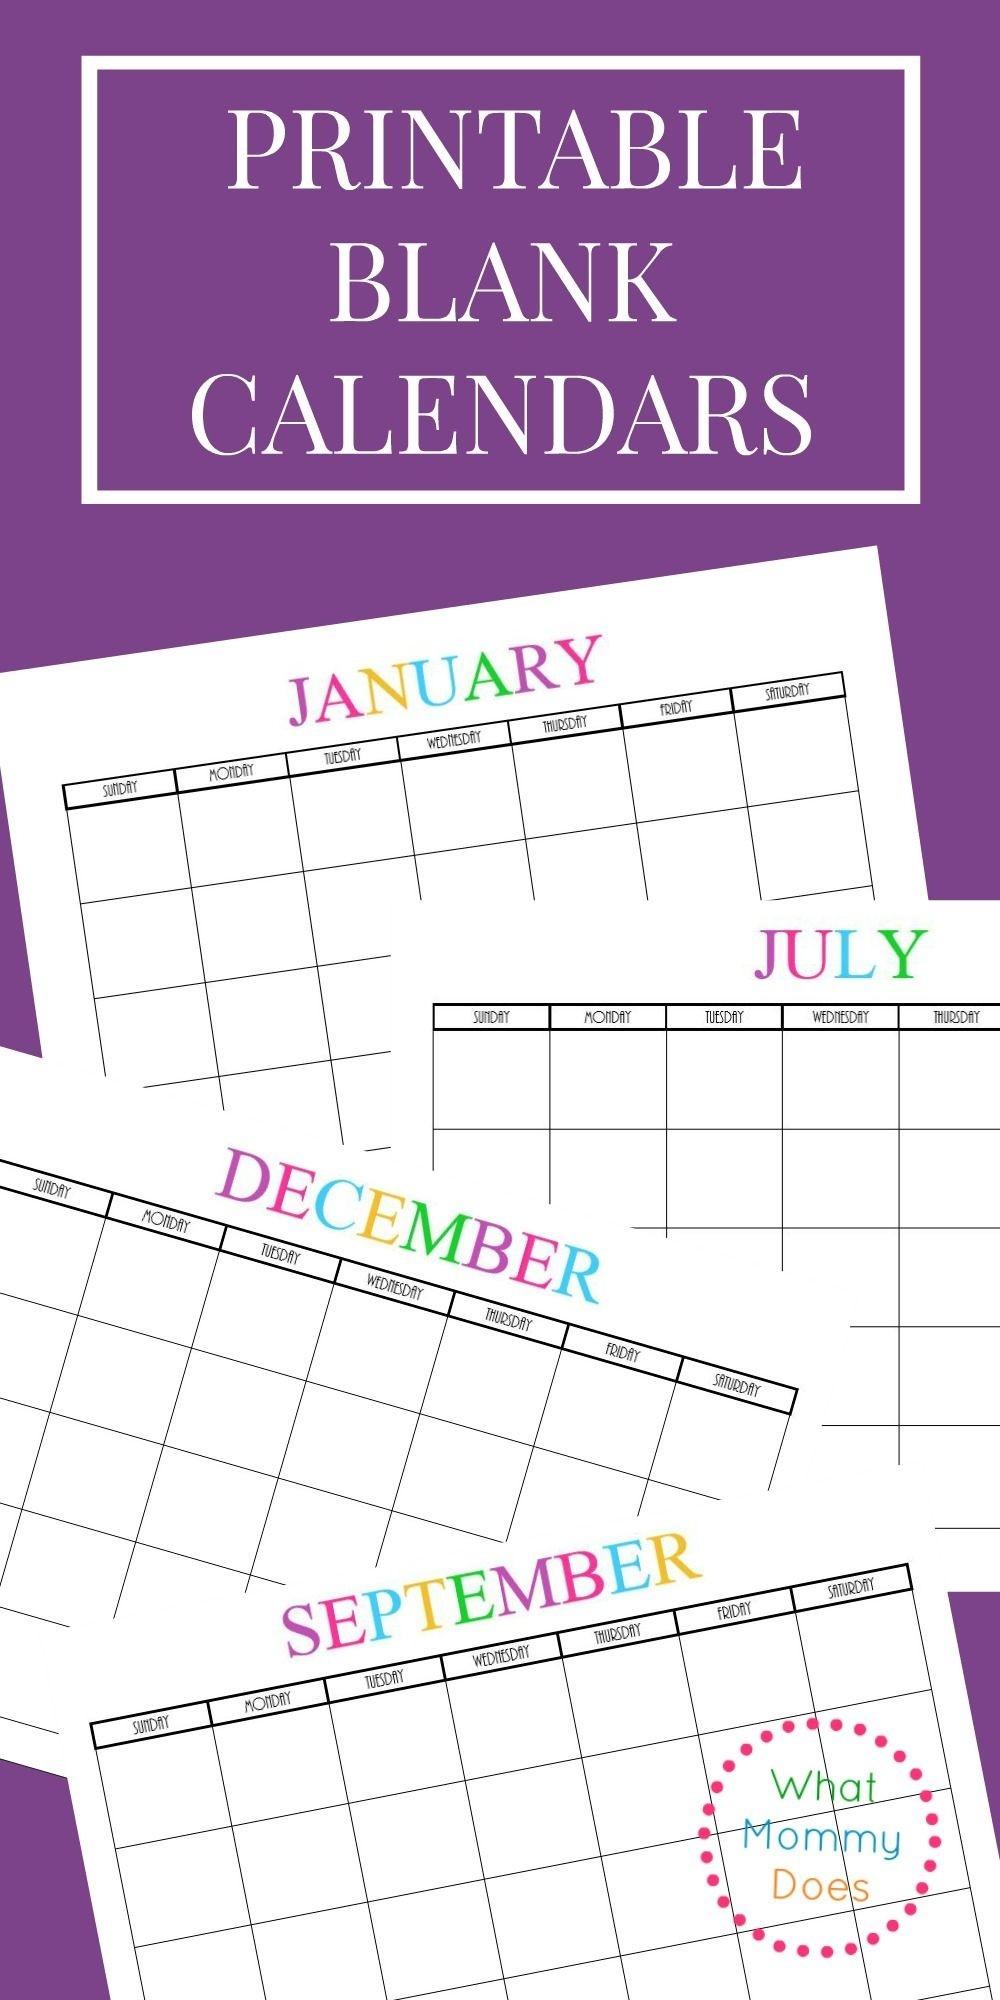 Free Printable Blank Monthly Calendars – 2018, 2019, 2020-Monthly Bill Calendar 2020